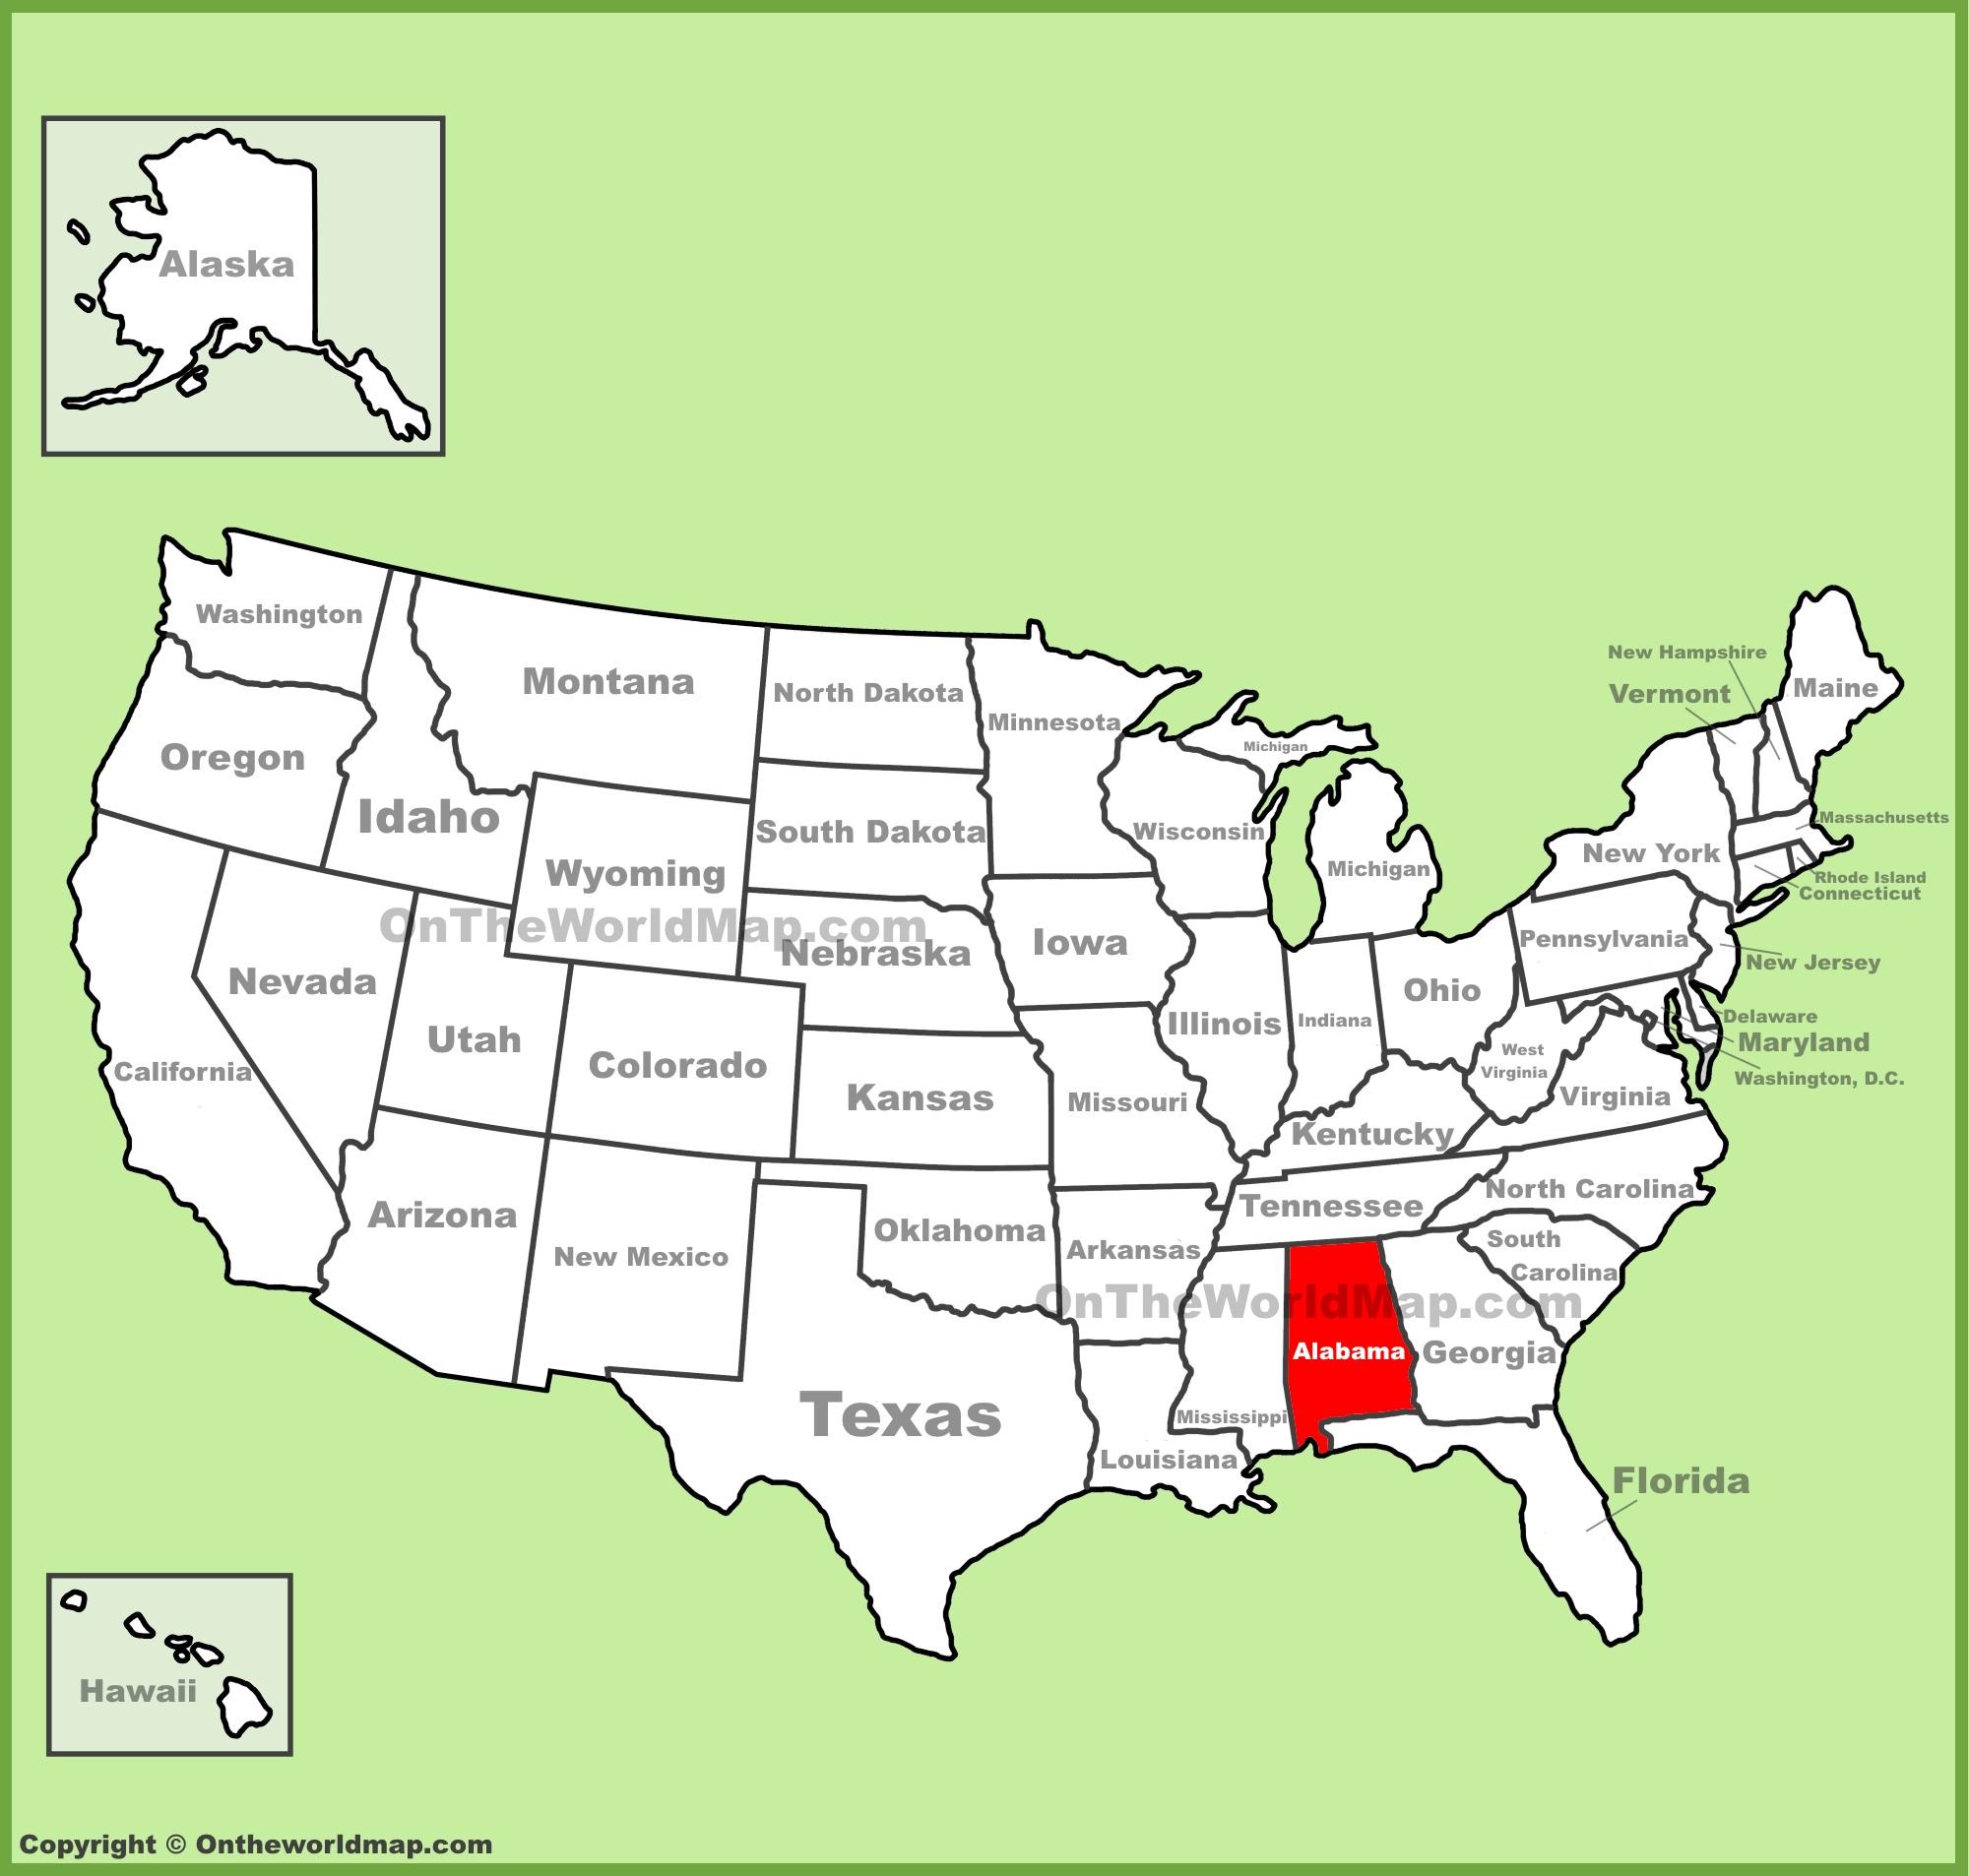 Alabama Location On The U.s. Map - Full Map Of California